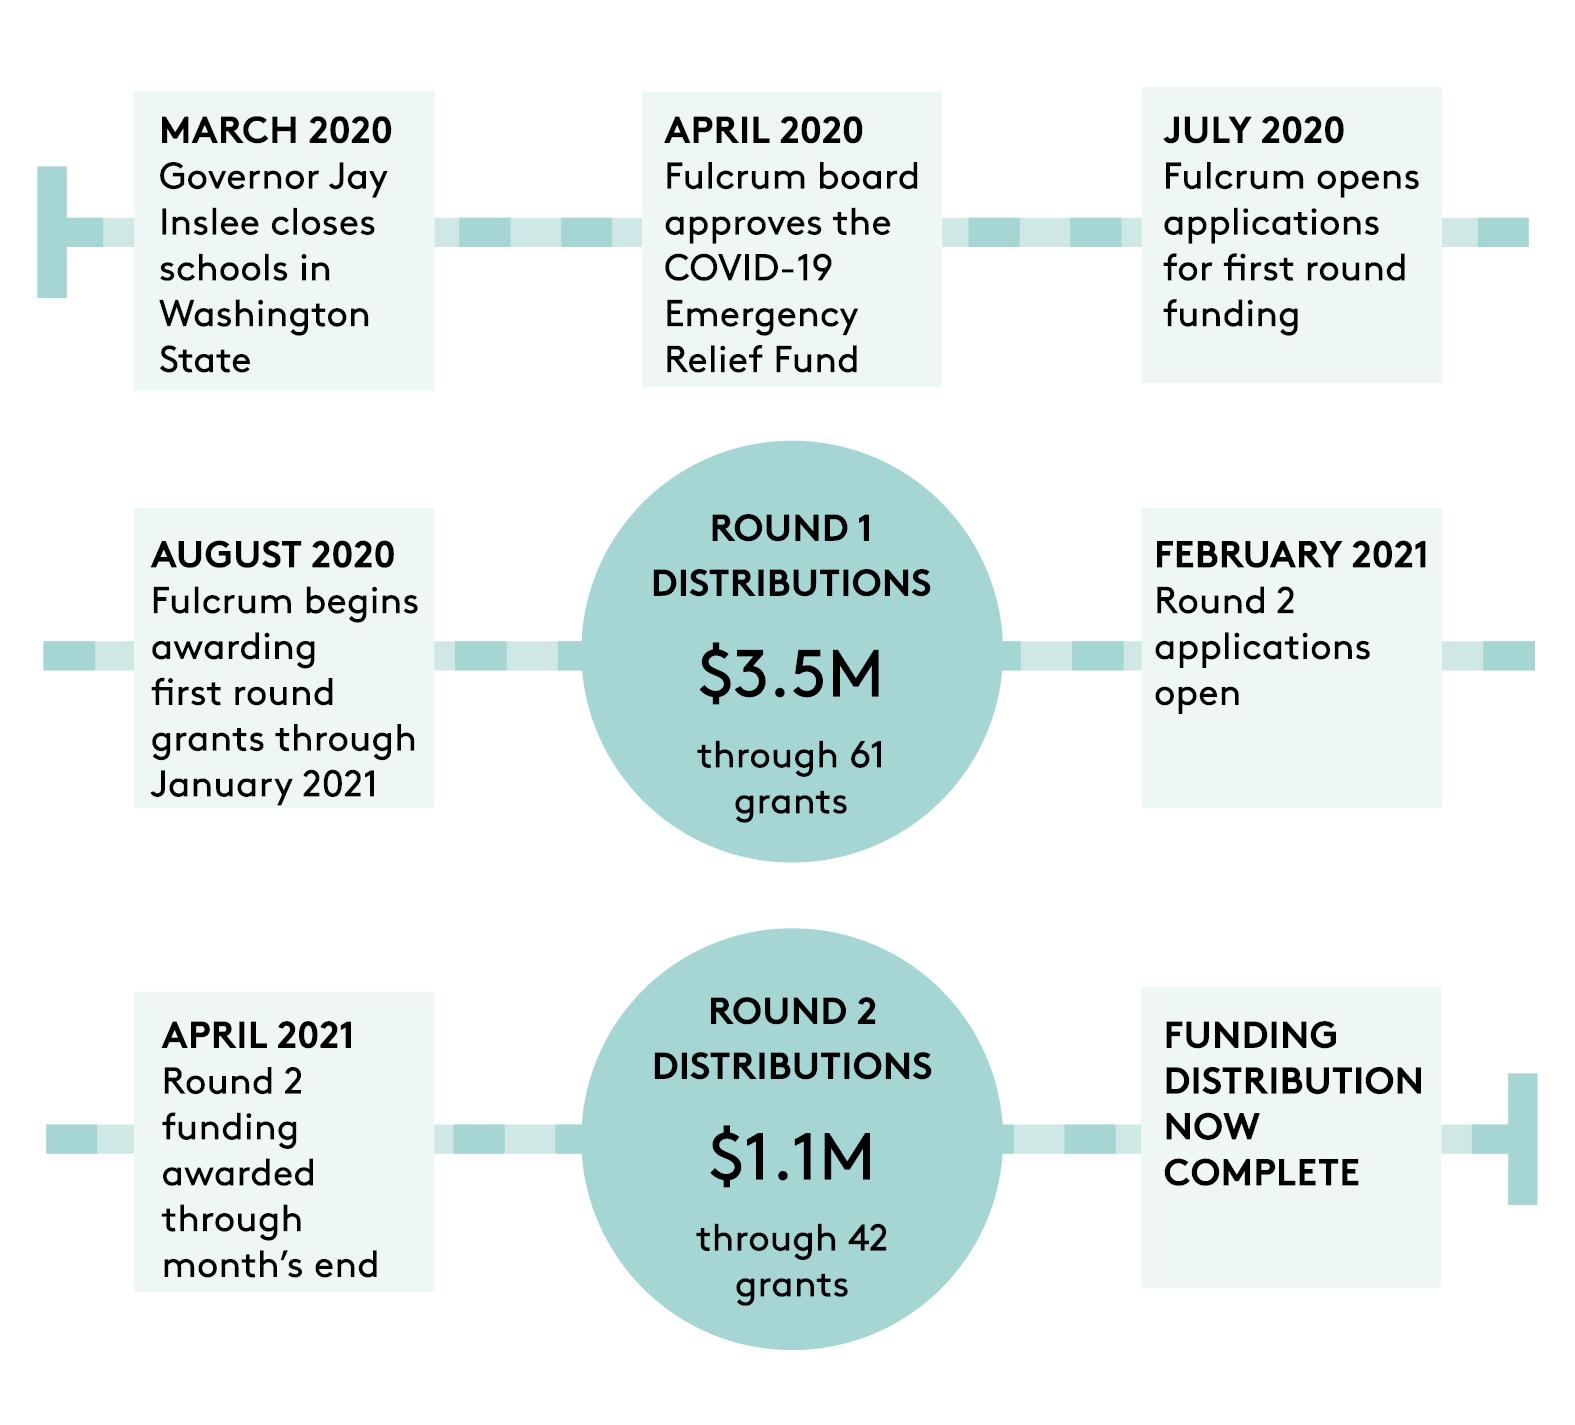 infographic-timeline.jpg#asset:3778